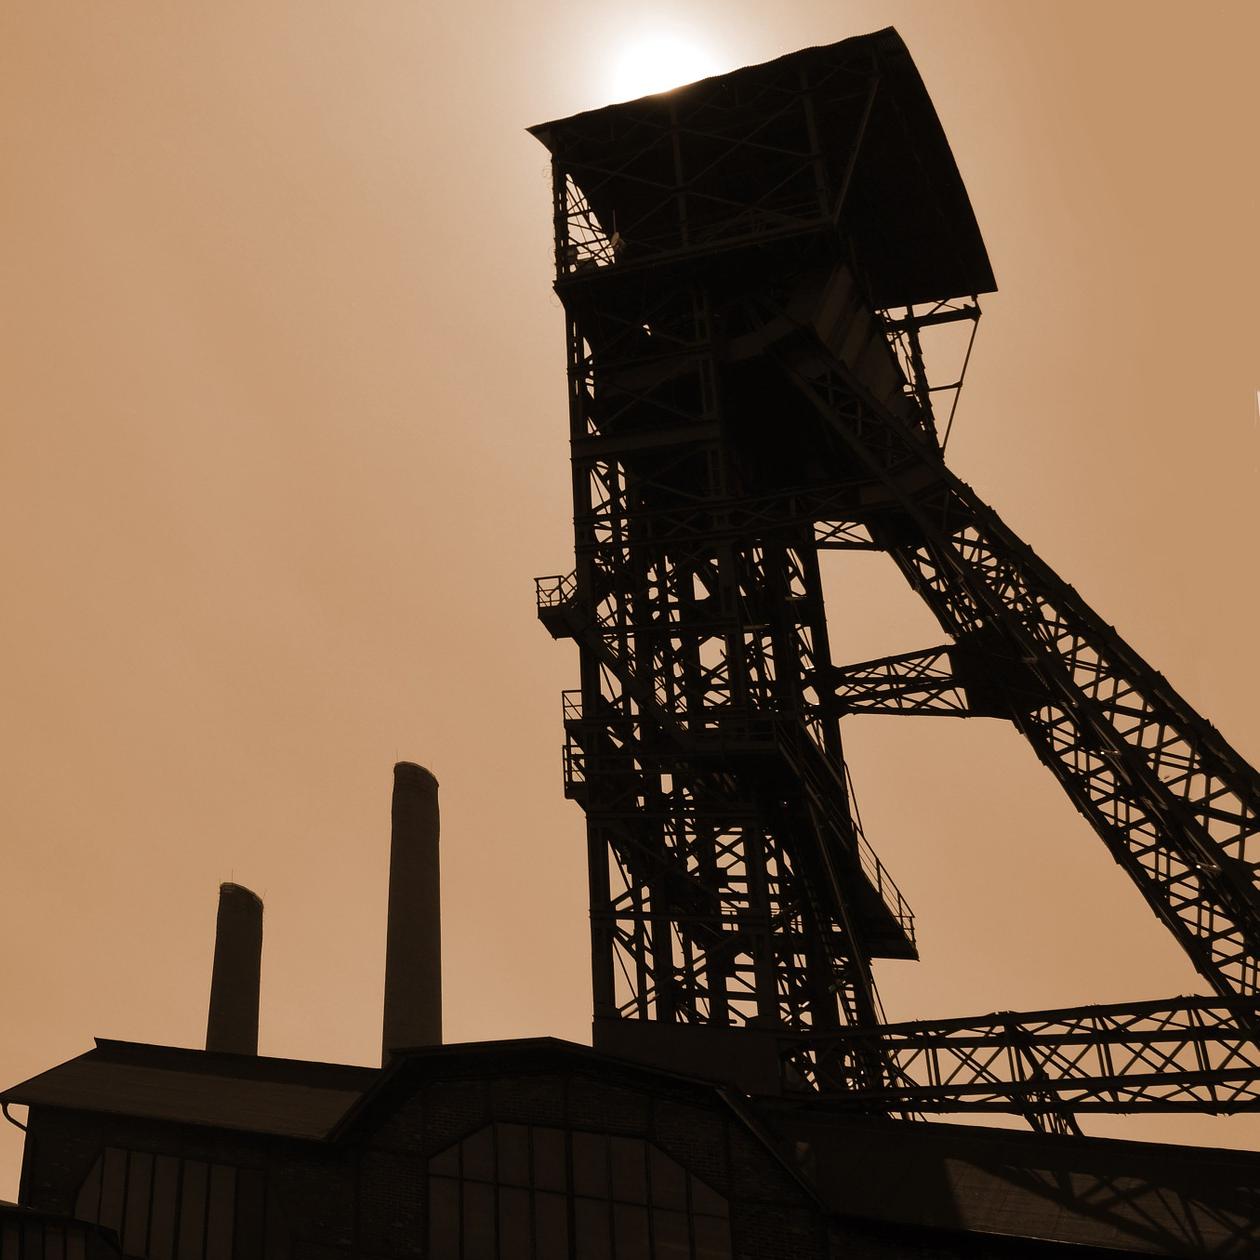 industry-810799_1920